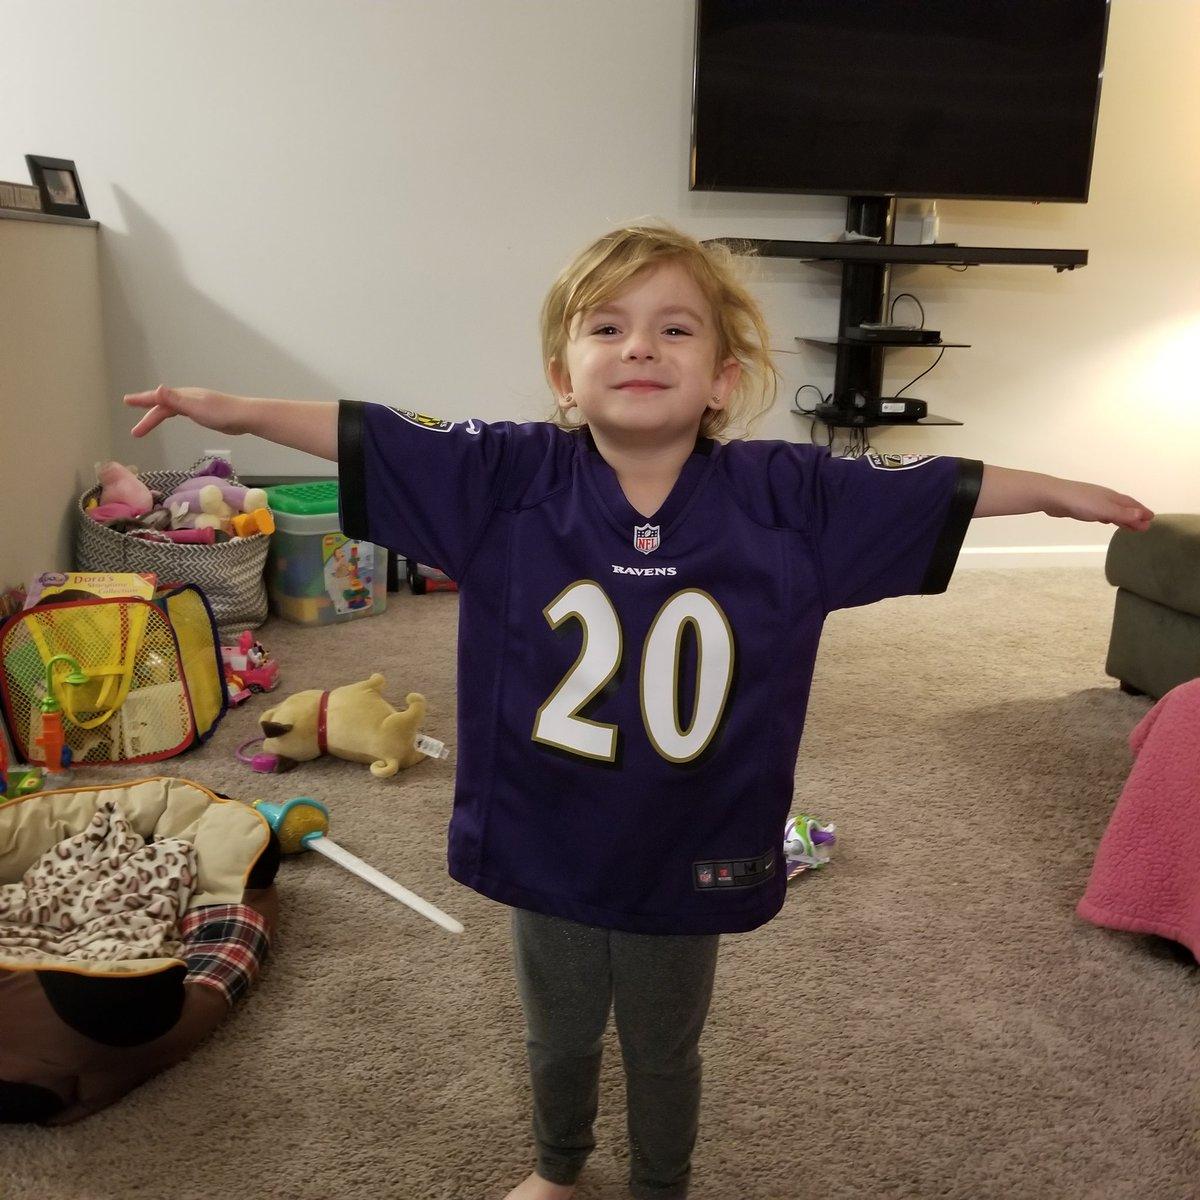 Ravens Fly!!!! Congratulations @EReed20 from Lucy!!!!!! #RavensFlock #RavensvsPatriots #ravenflock #raylewis https://t.co/ijxnzWUv1f